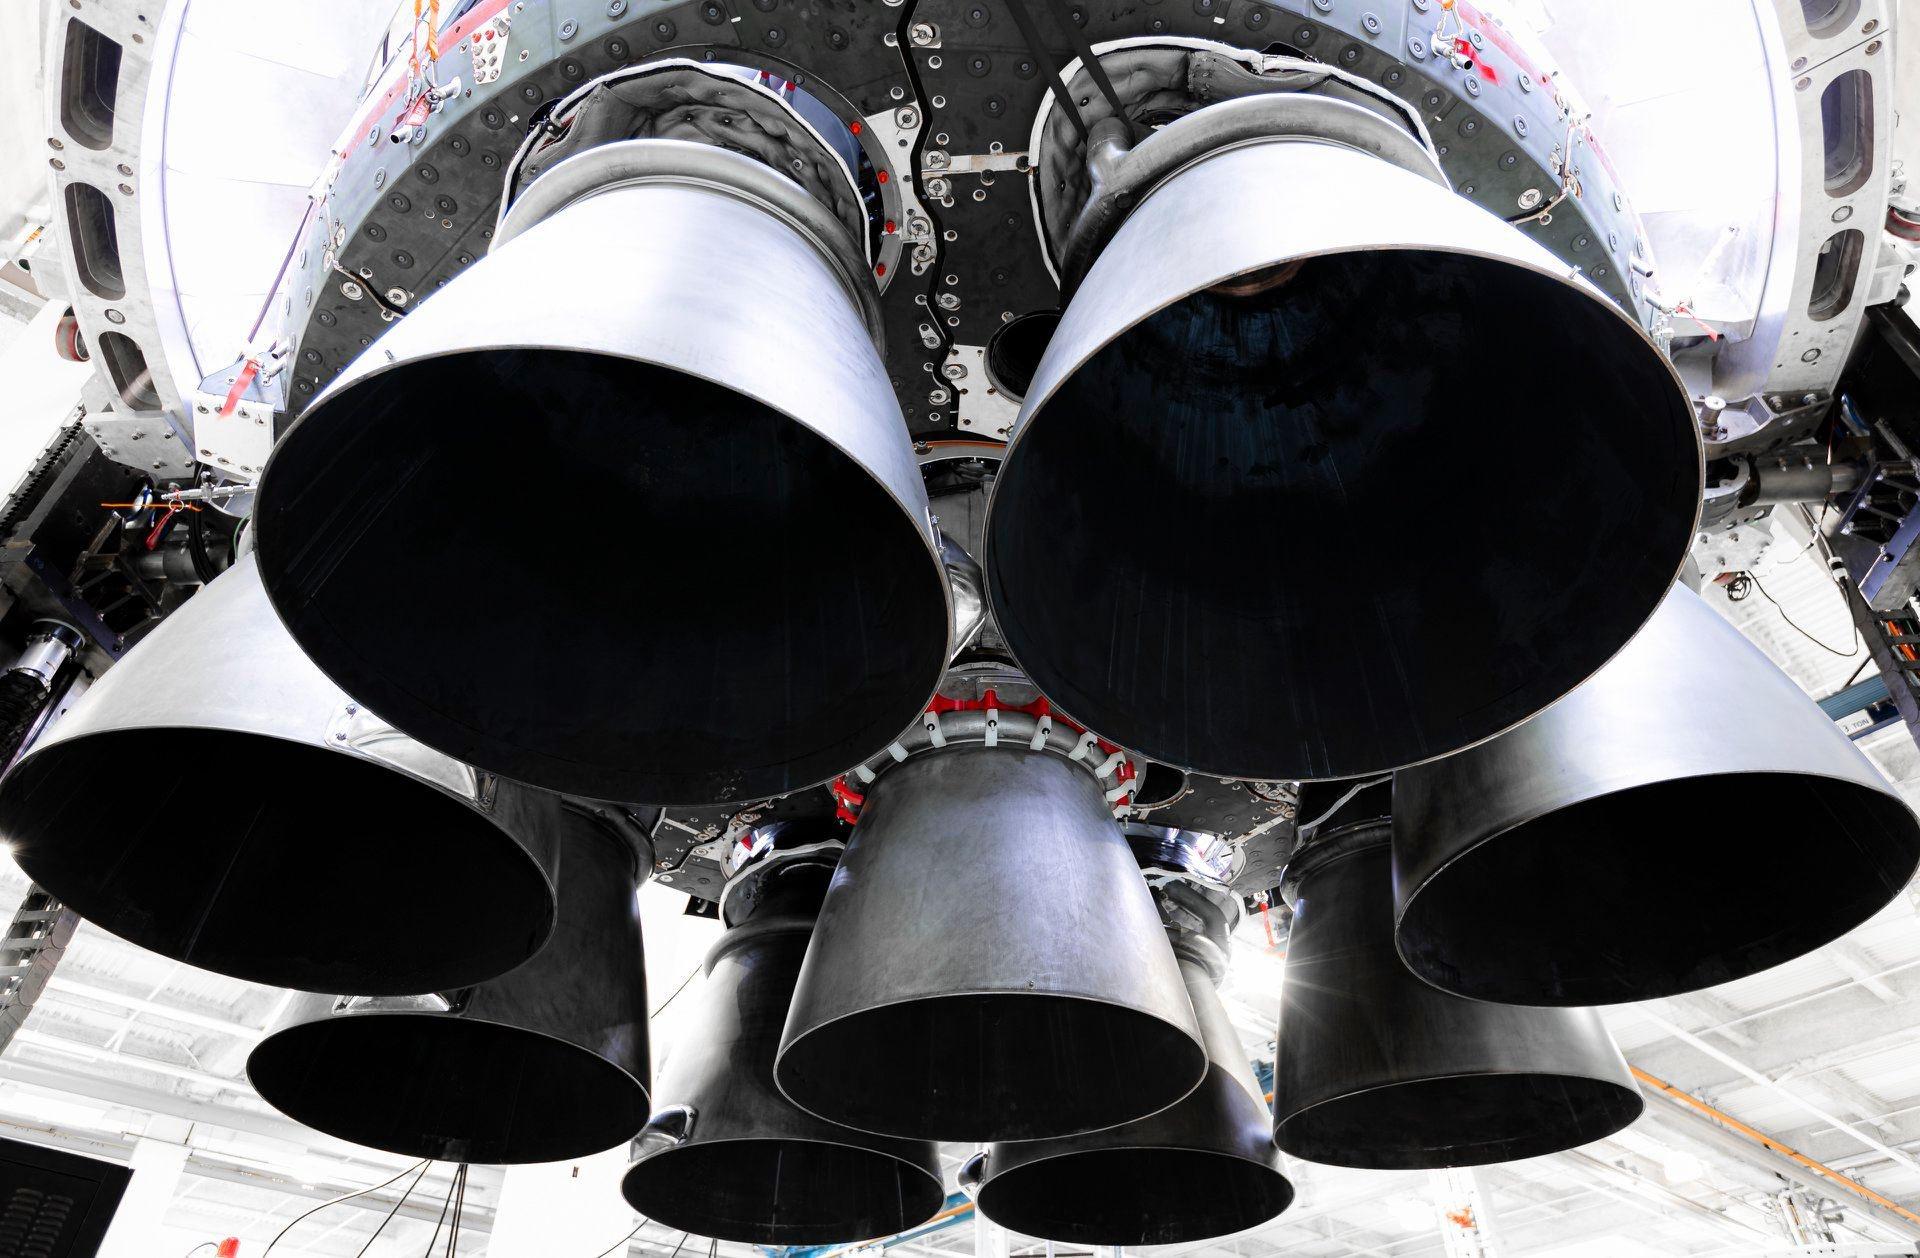 Falcon 9's Merlin engines.